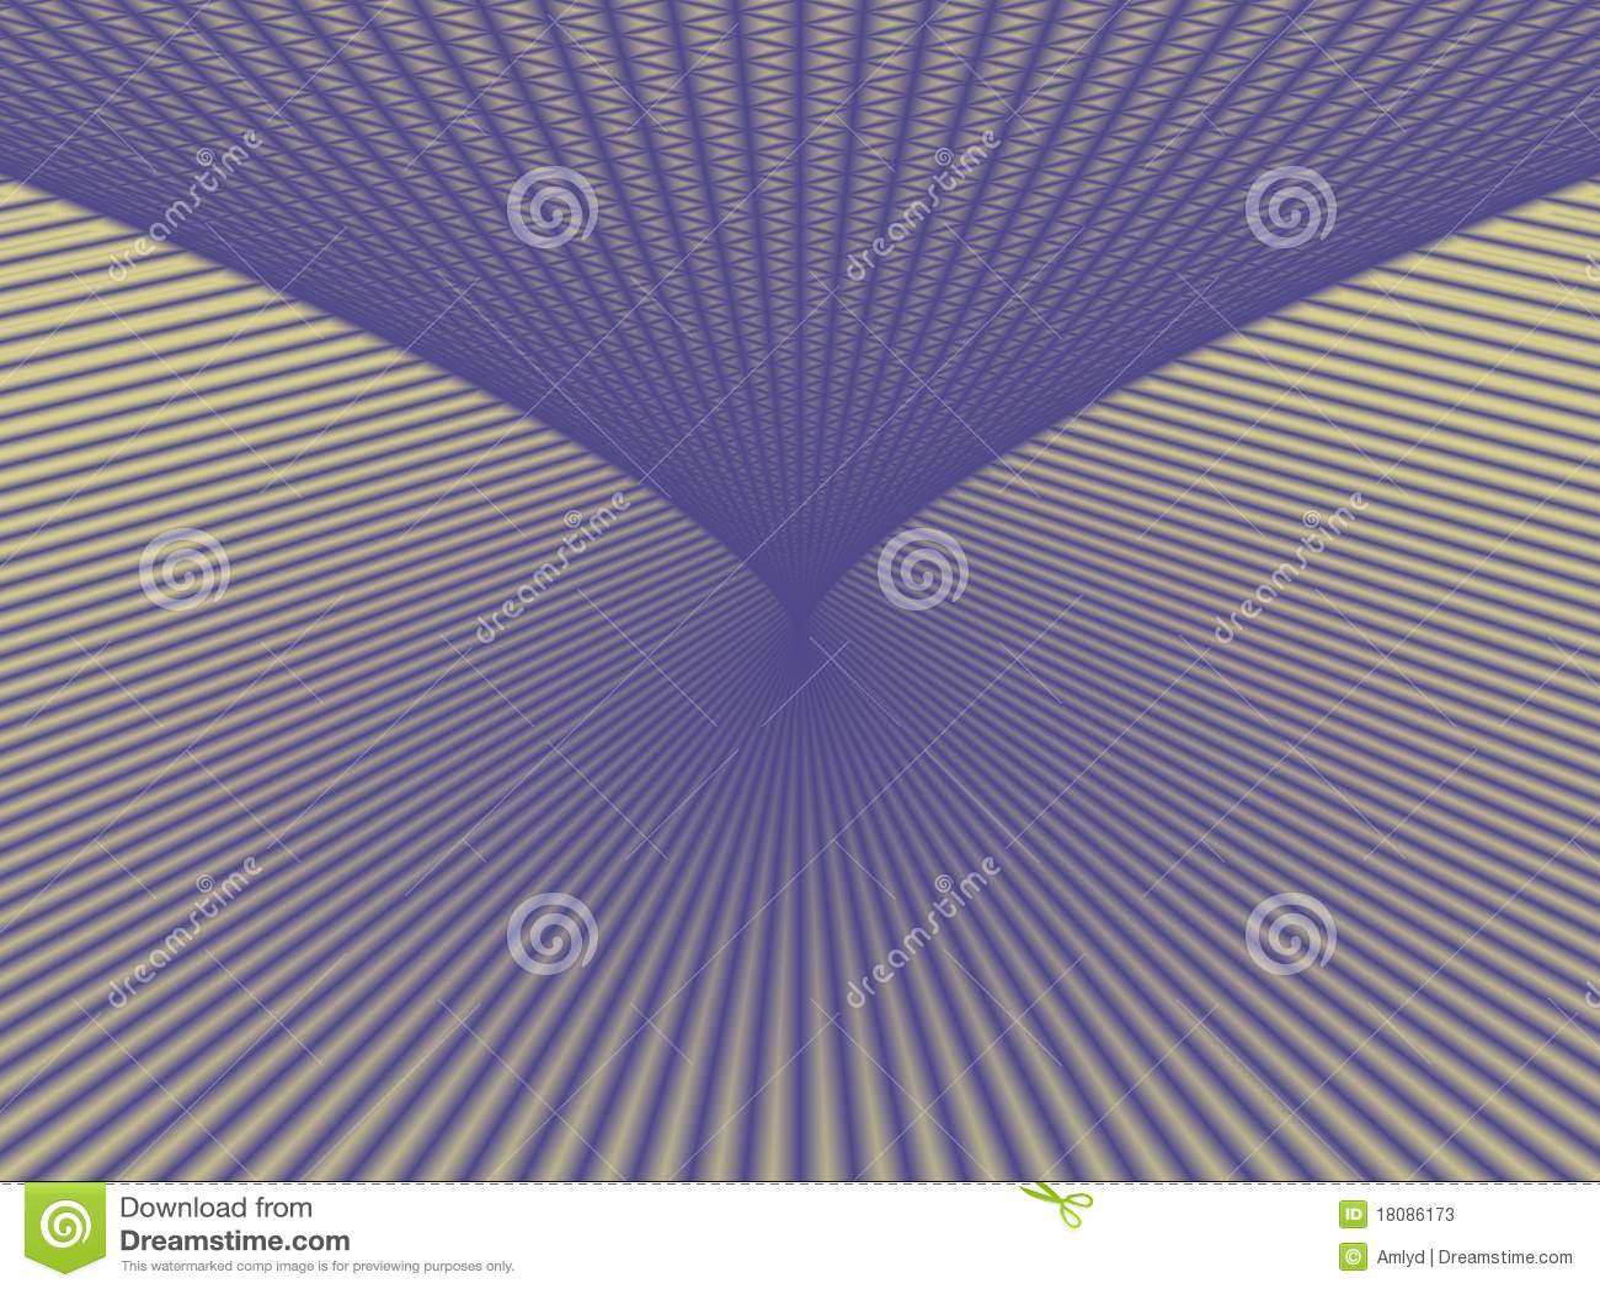 Uitzinnige illusie